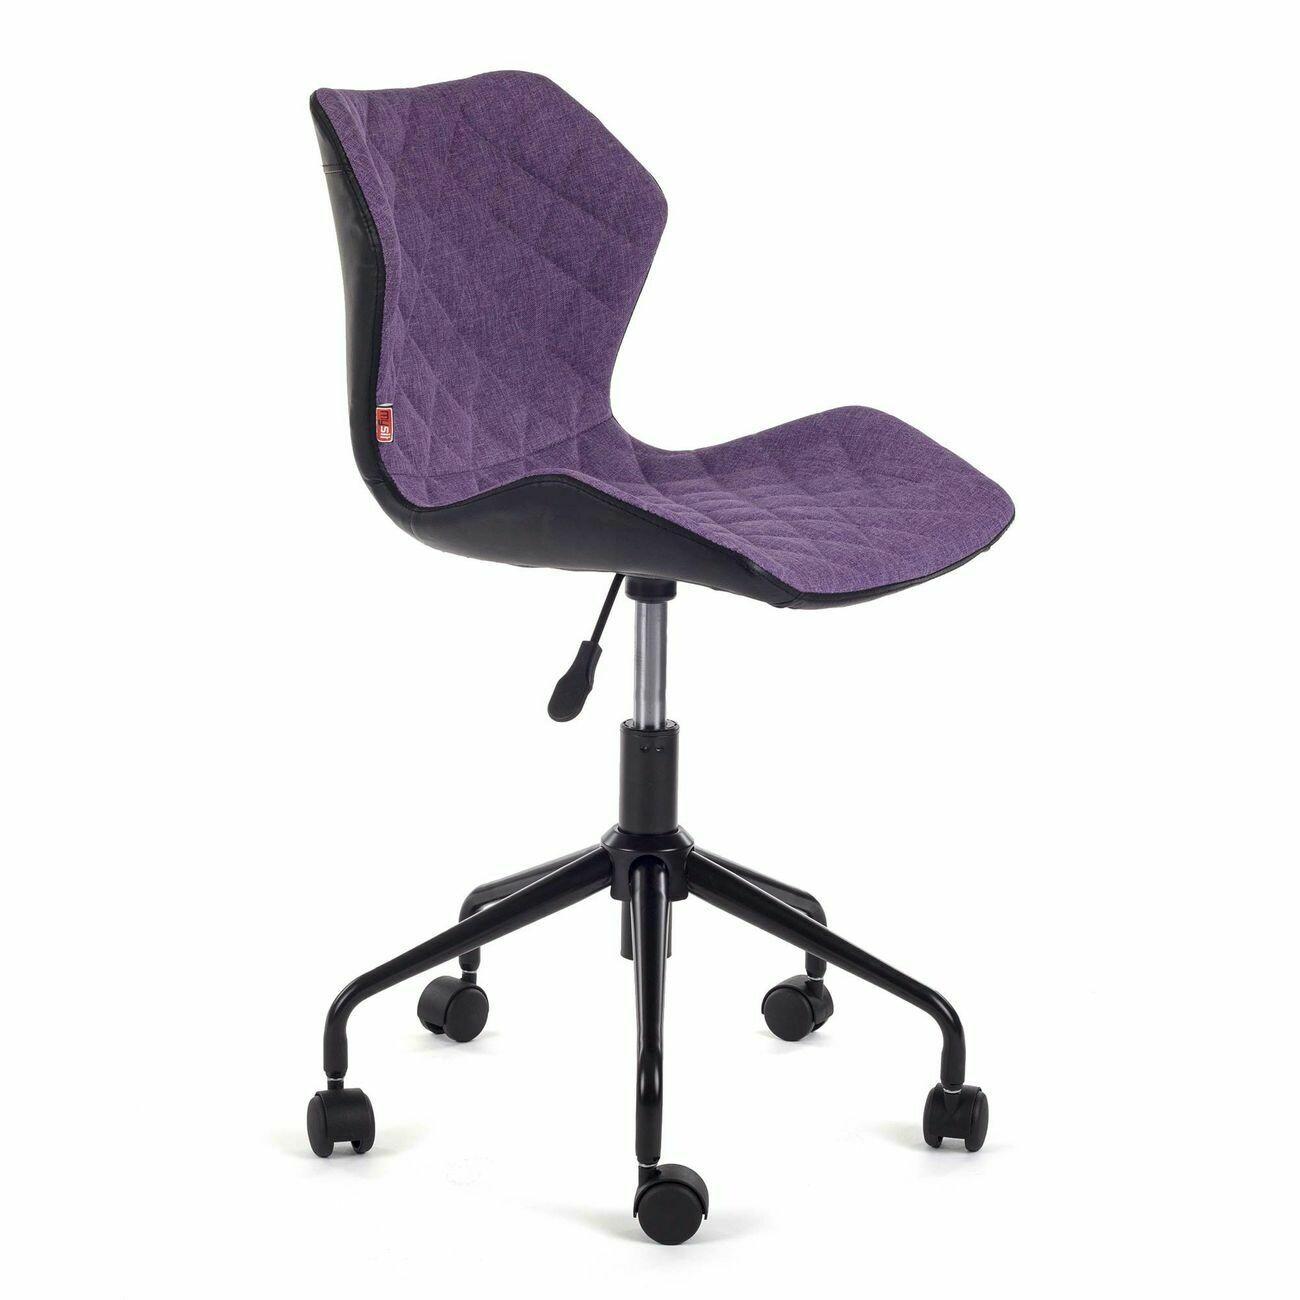 MY SIT Bürostuhl Design-Hocker Drehstuhl Stuhl INO Violett/Schwarz